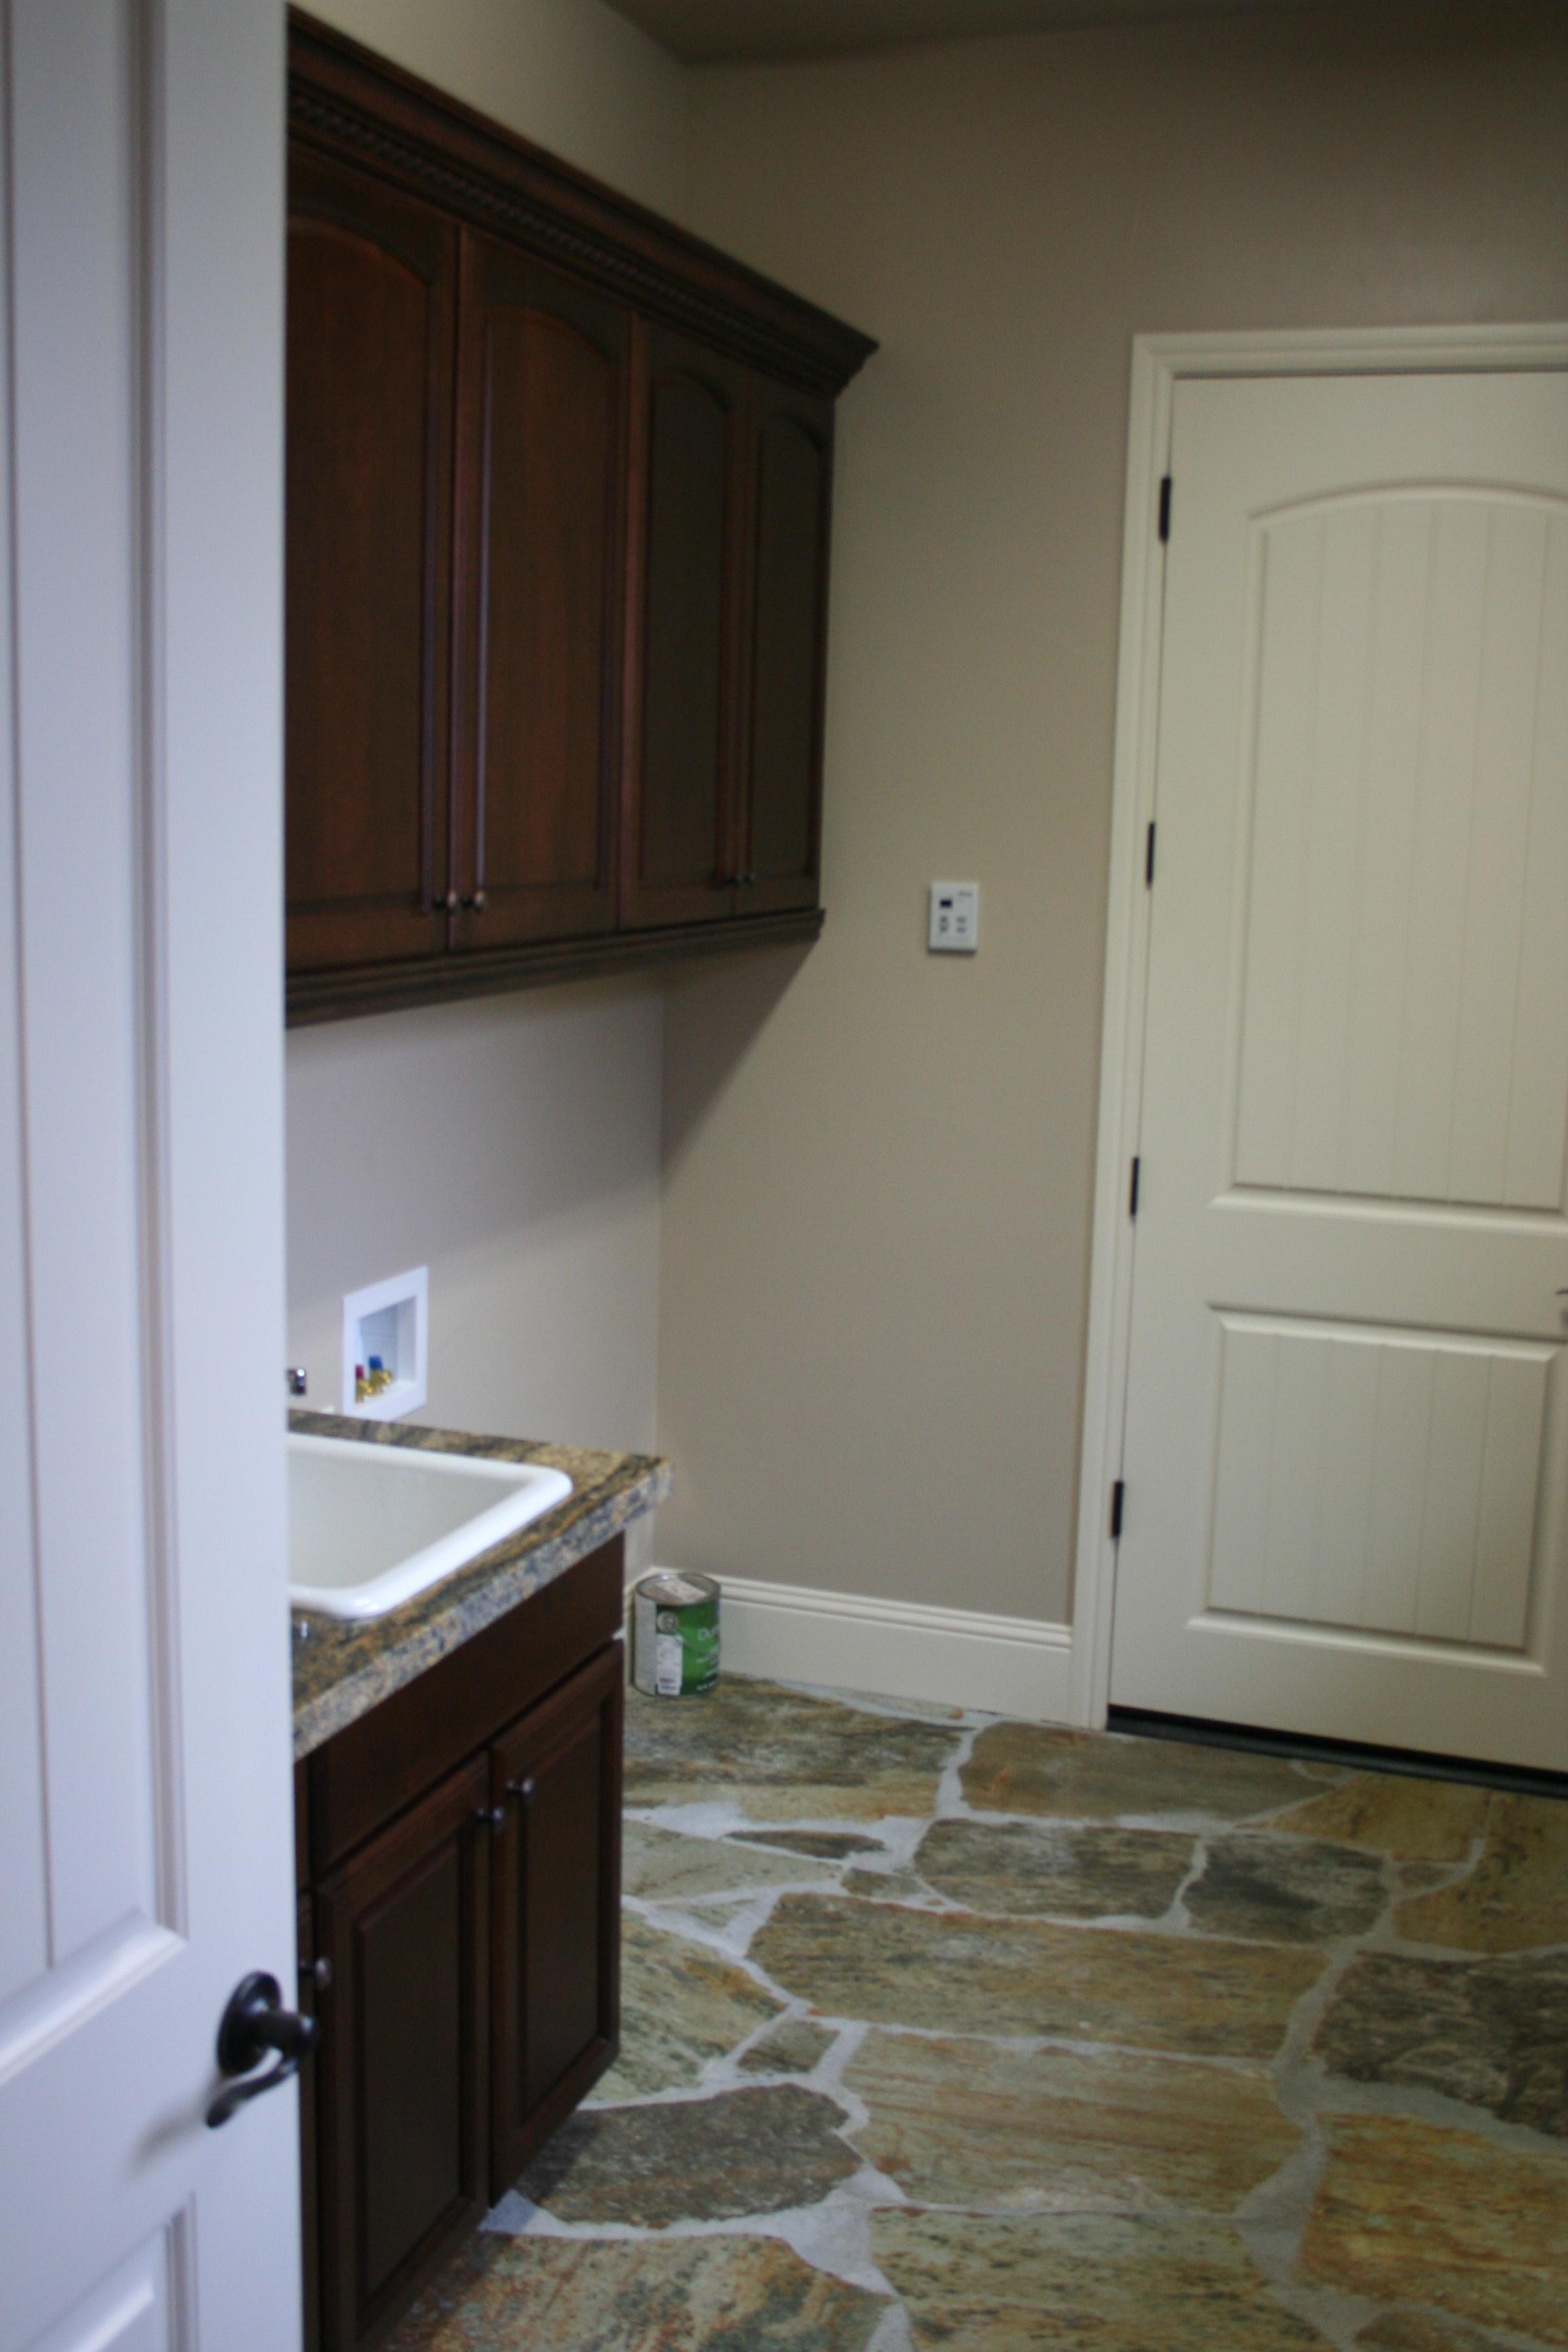 84-laundry room sink.JPG